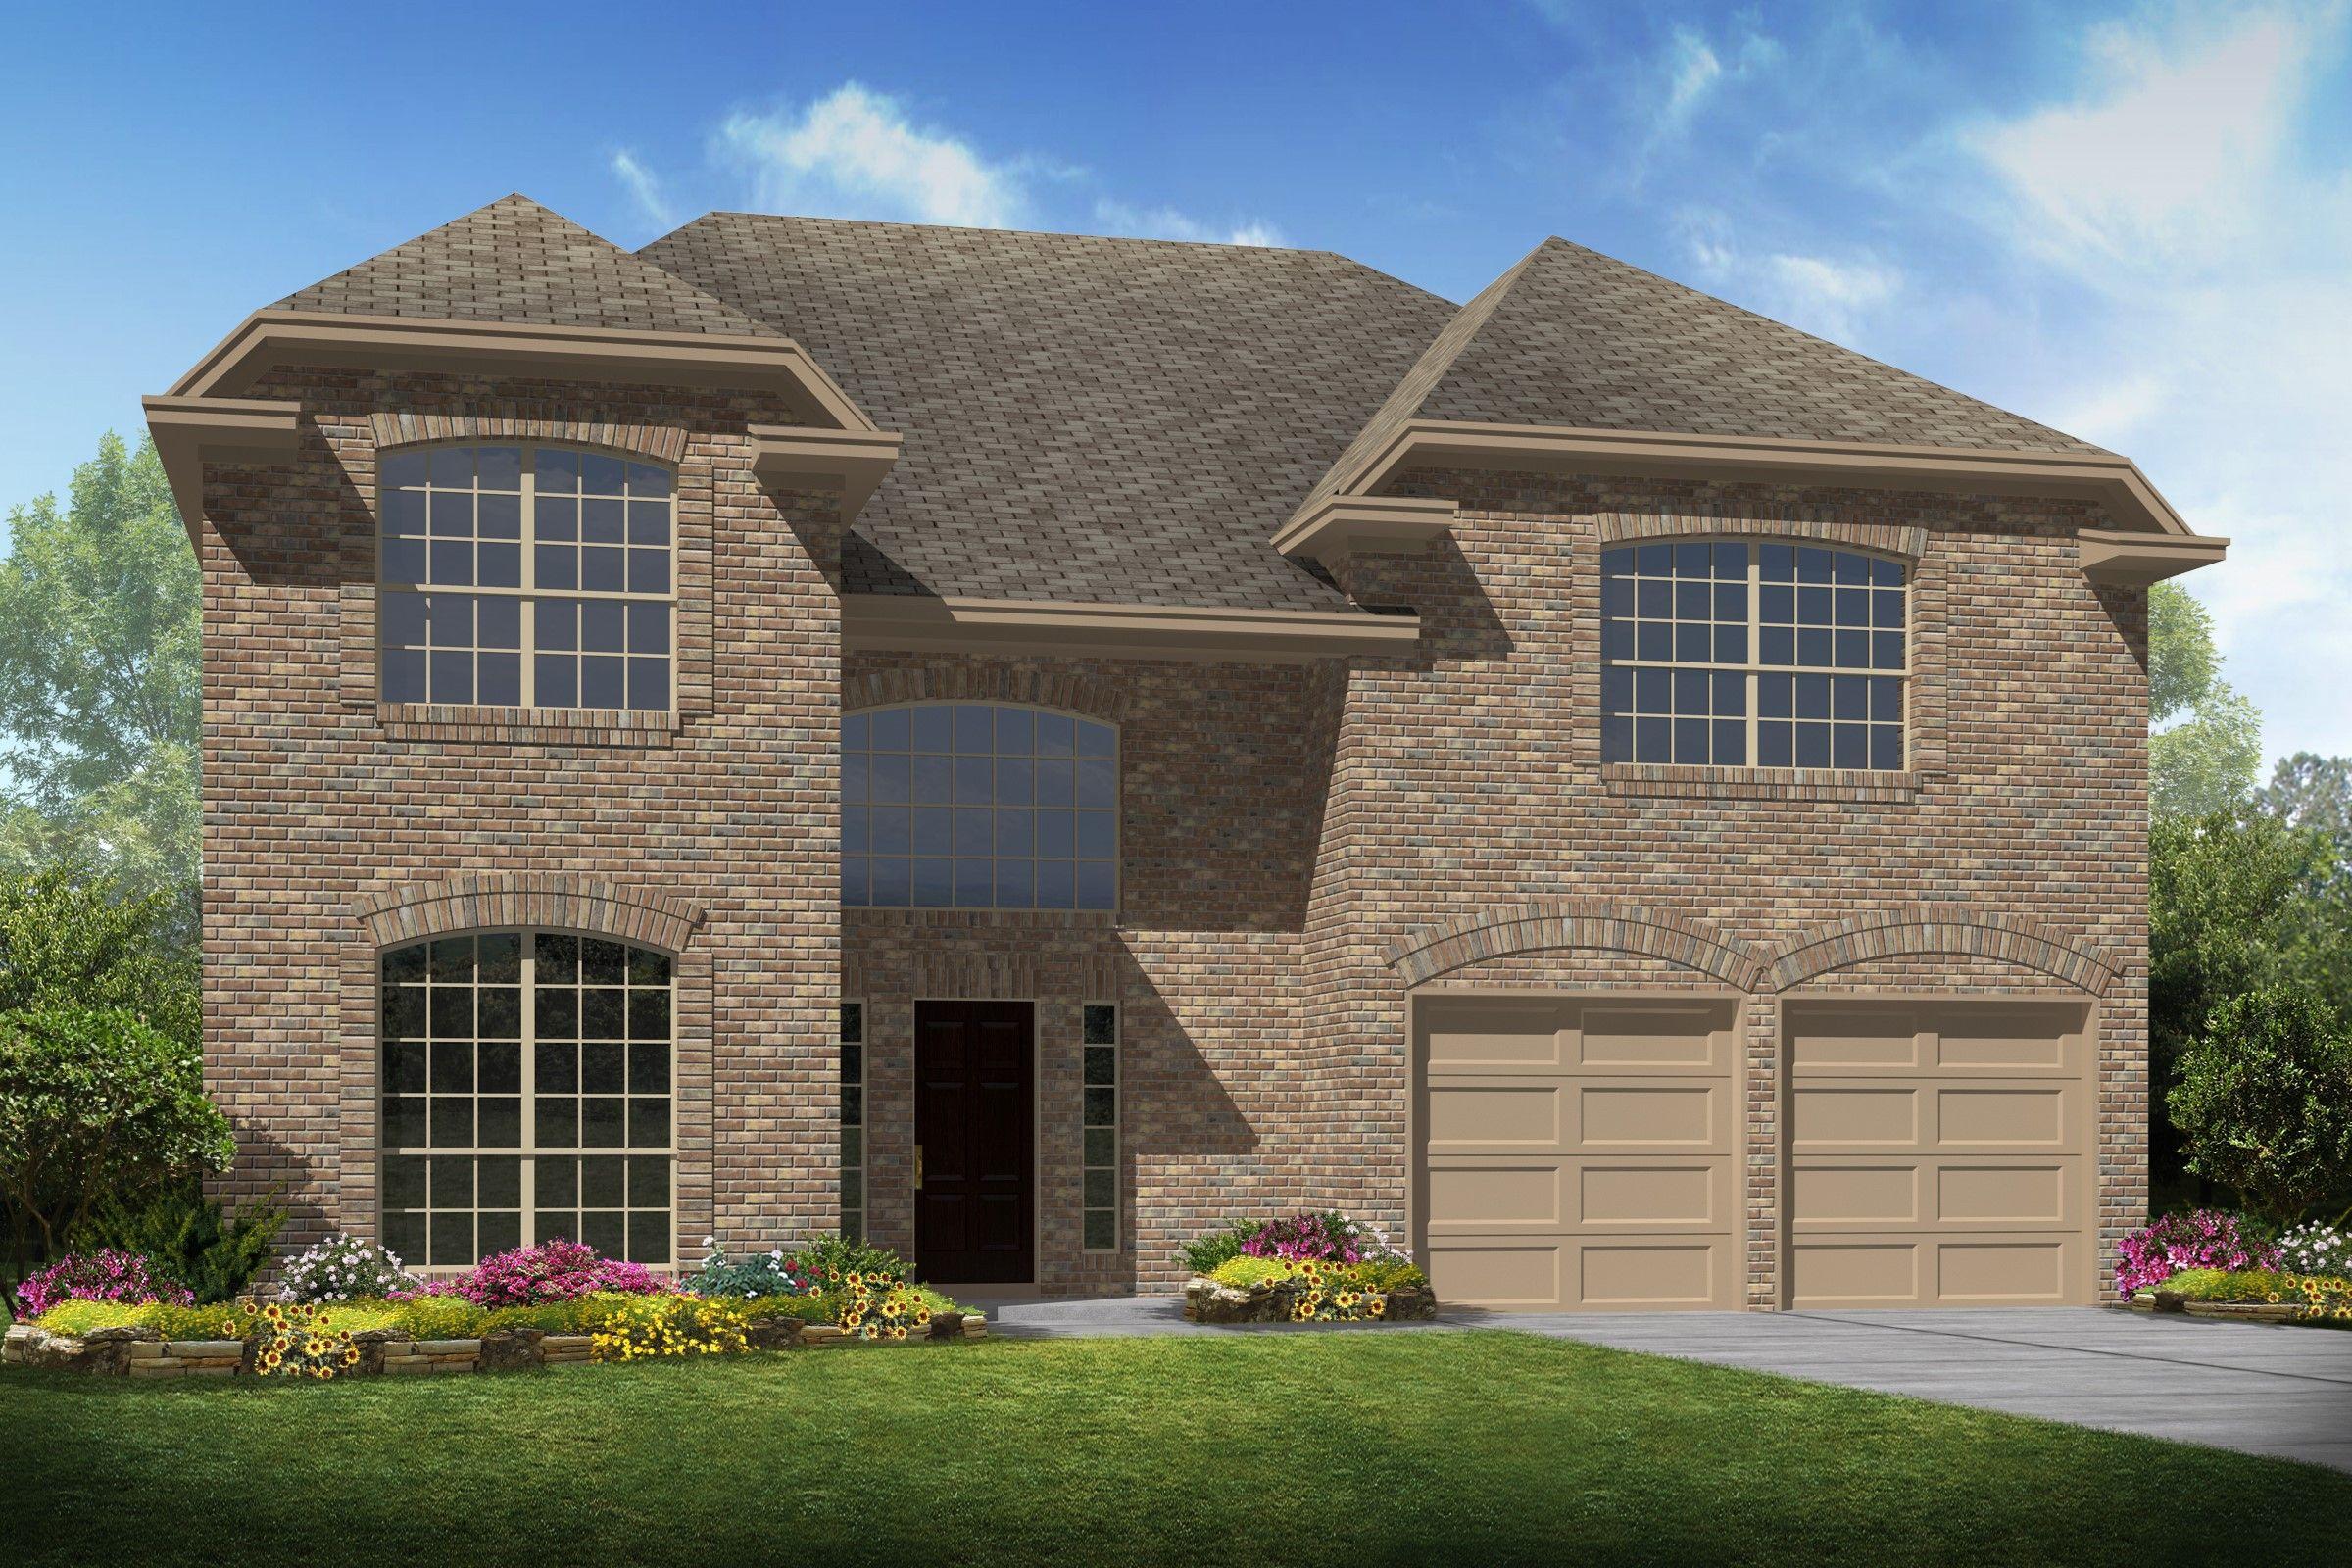 Single Family for Sale at Gaston Ii 4404 Braunig Lake Drive Dickinson, Texas 77539 United States